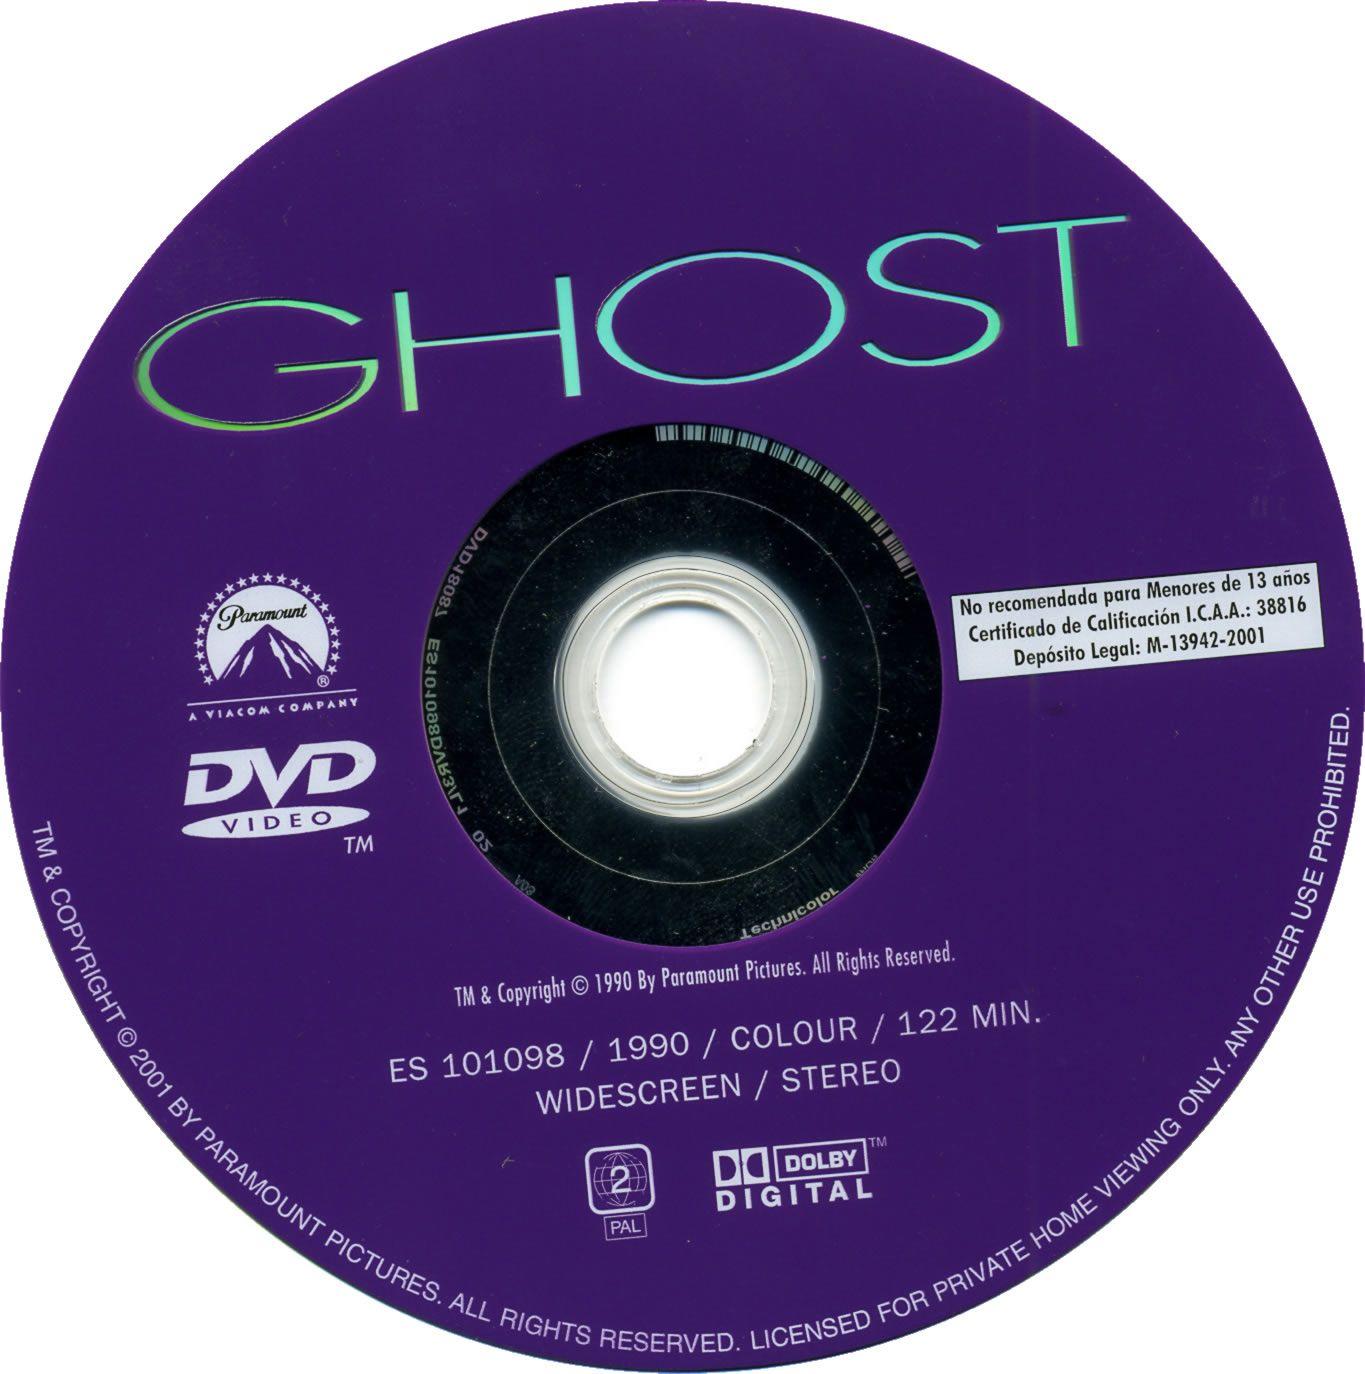 http://4.bp.blogspot.com/-XDLn32UWb2E/TrodWdkmiUI/AAAAAAAAABc/Z1dZlk4pZ_A/s1600/Ghost+CD.jpg